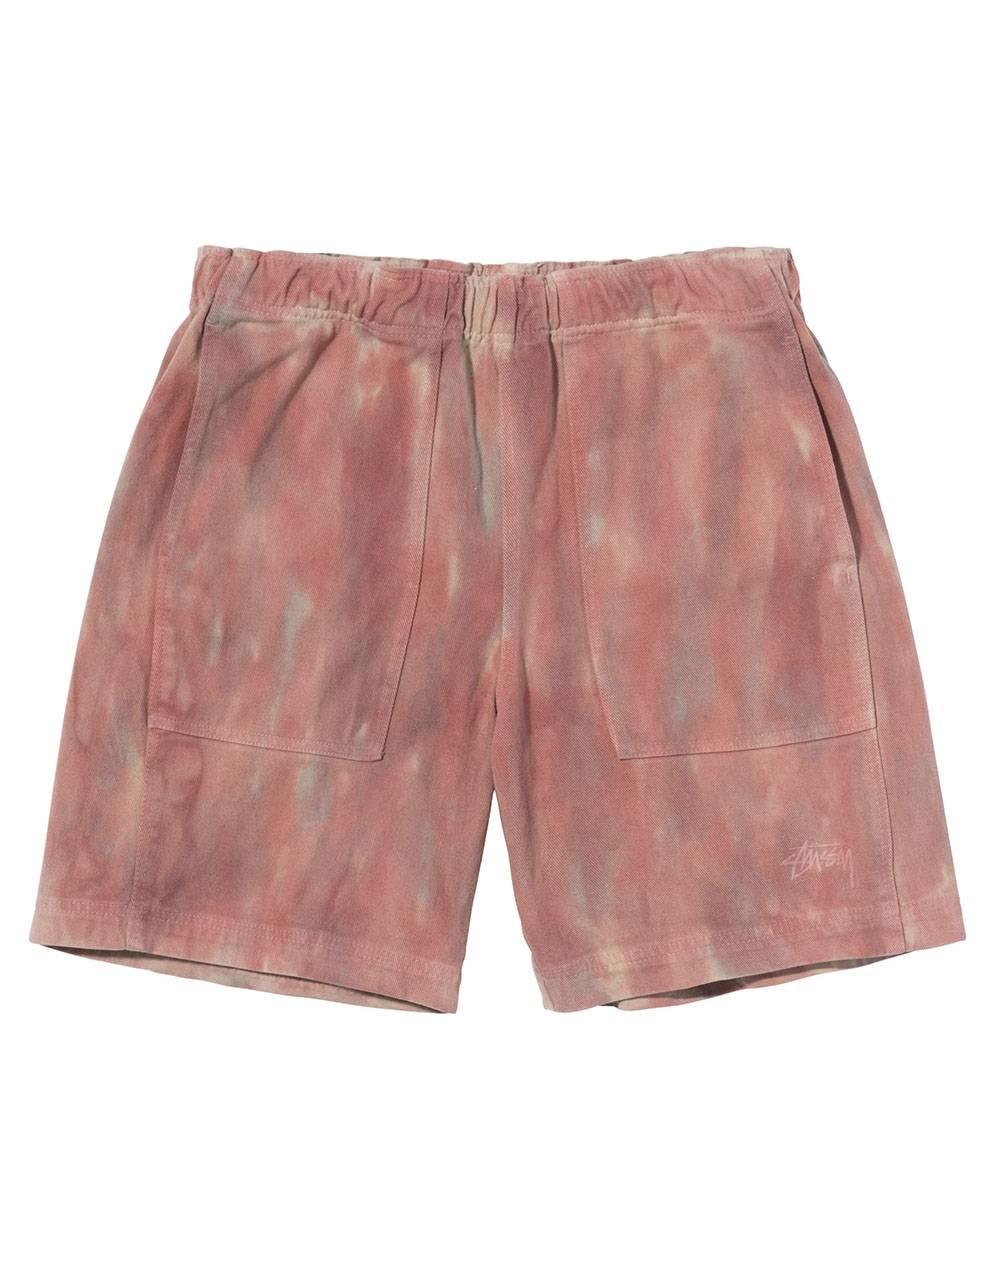 Stussy Dyed easy shorts - rust Stussy Shorts 105,74€